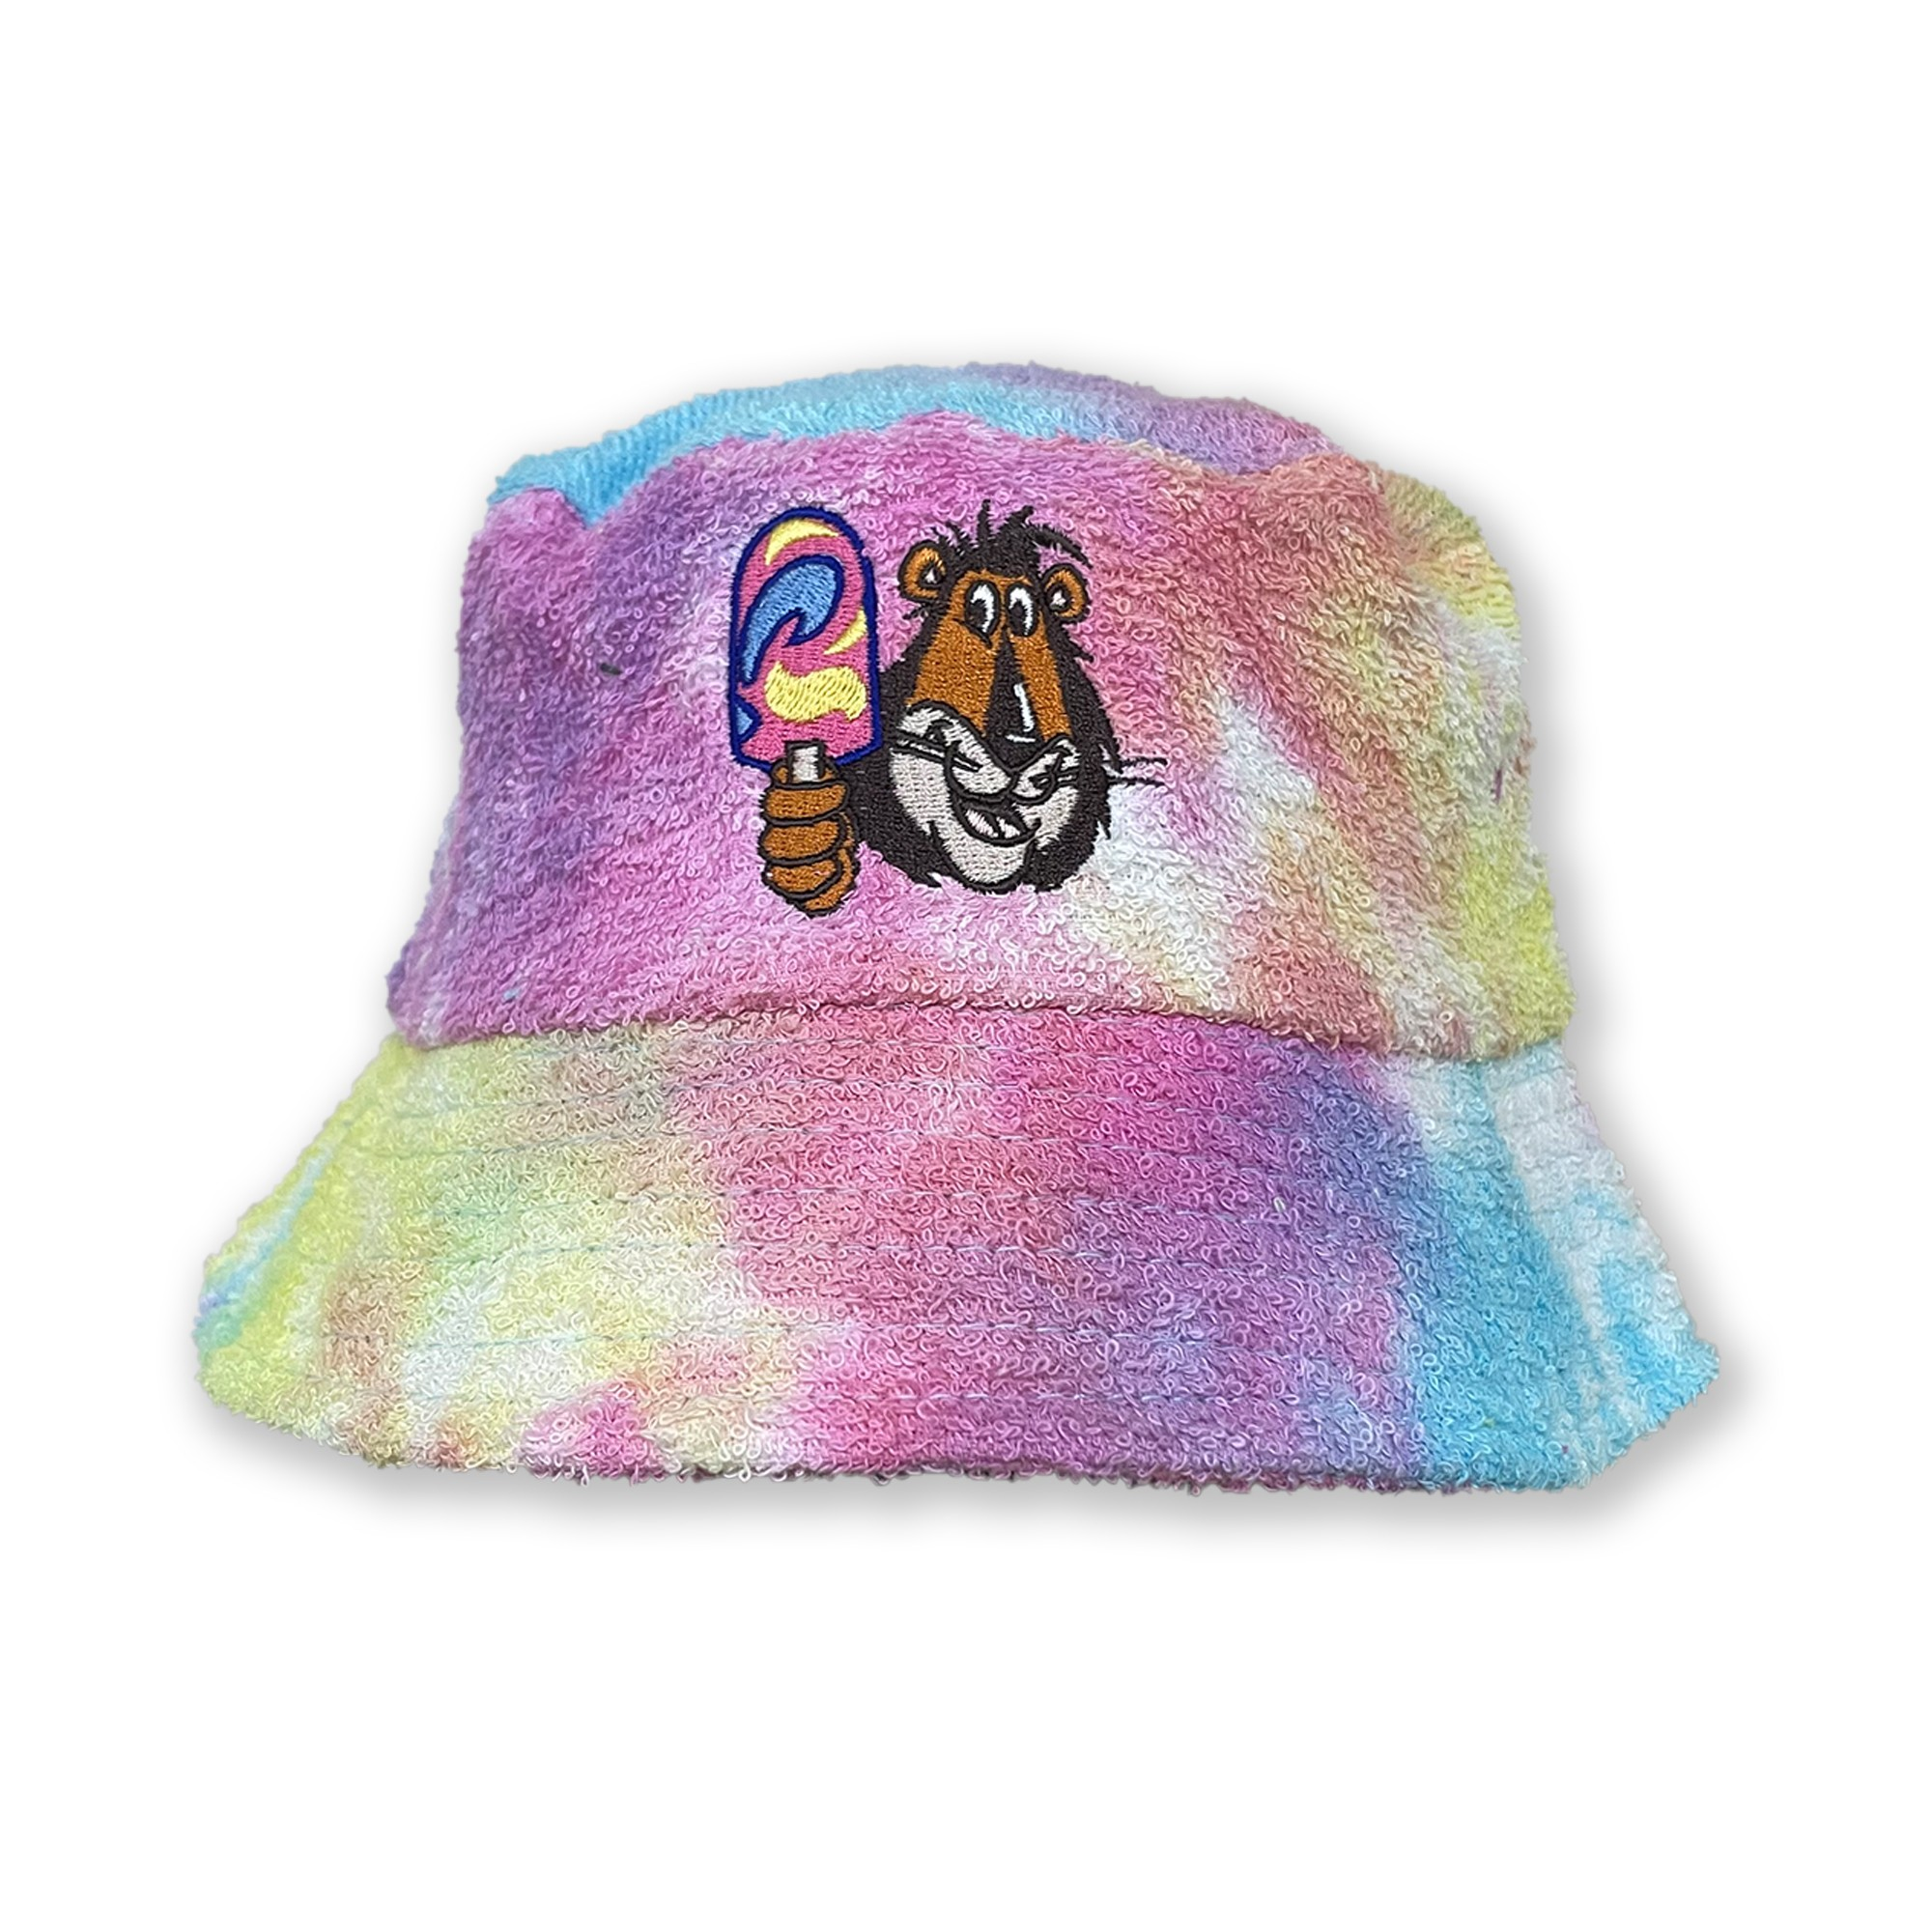 RAINBOW TIE DYE TERRY TOWEL BUCKET HAT